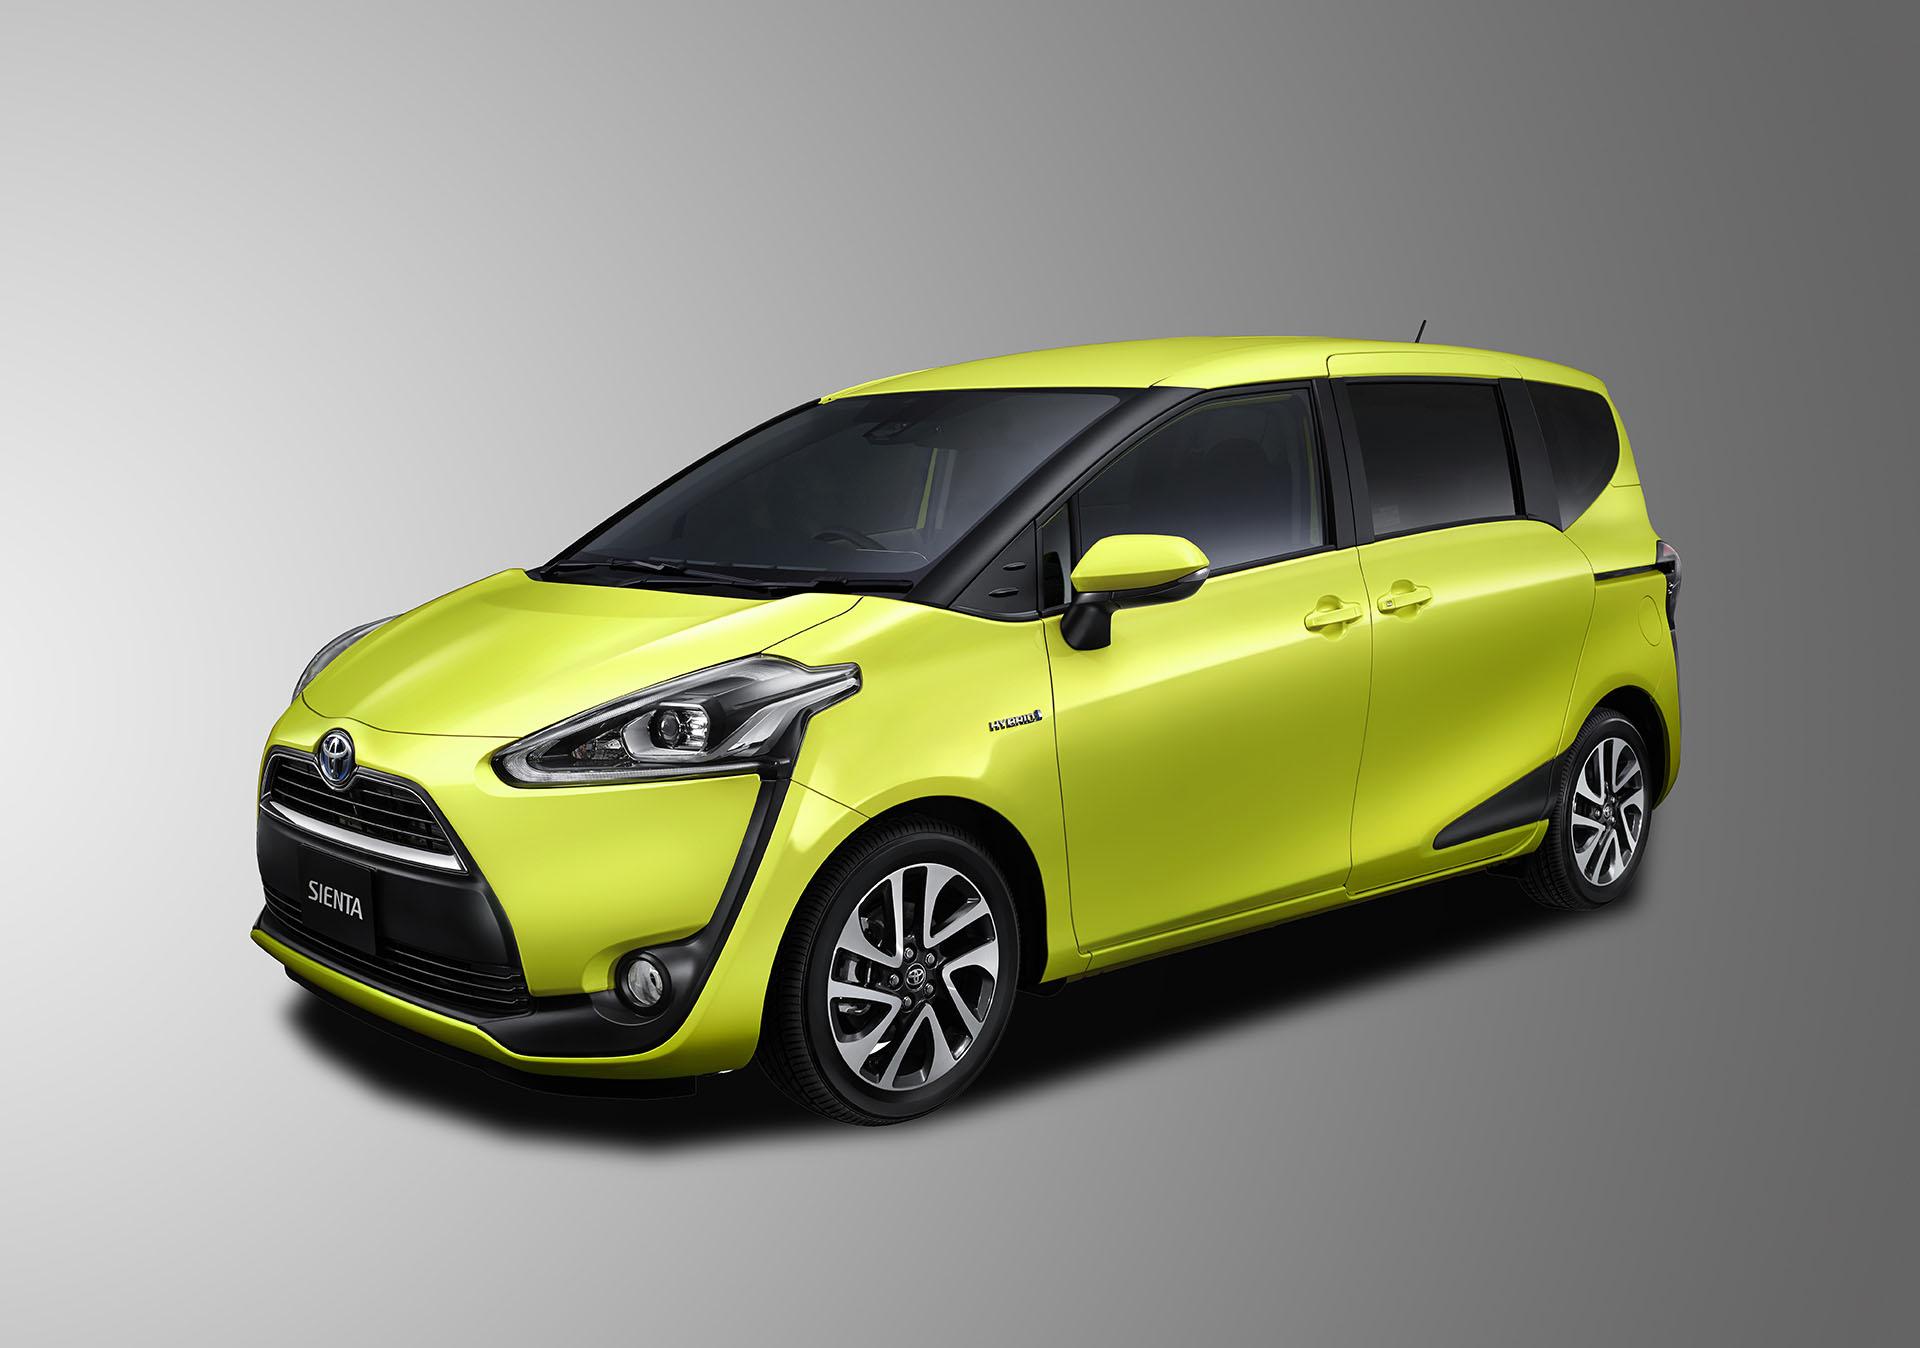 Toyota Sienta Hybrid Mpv Small Minivan Forbidden Fruit Or Bizarre Oddity